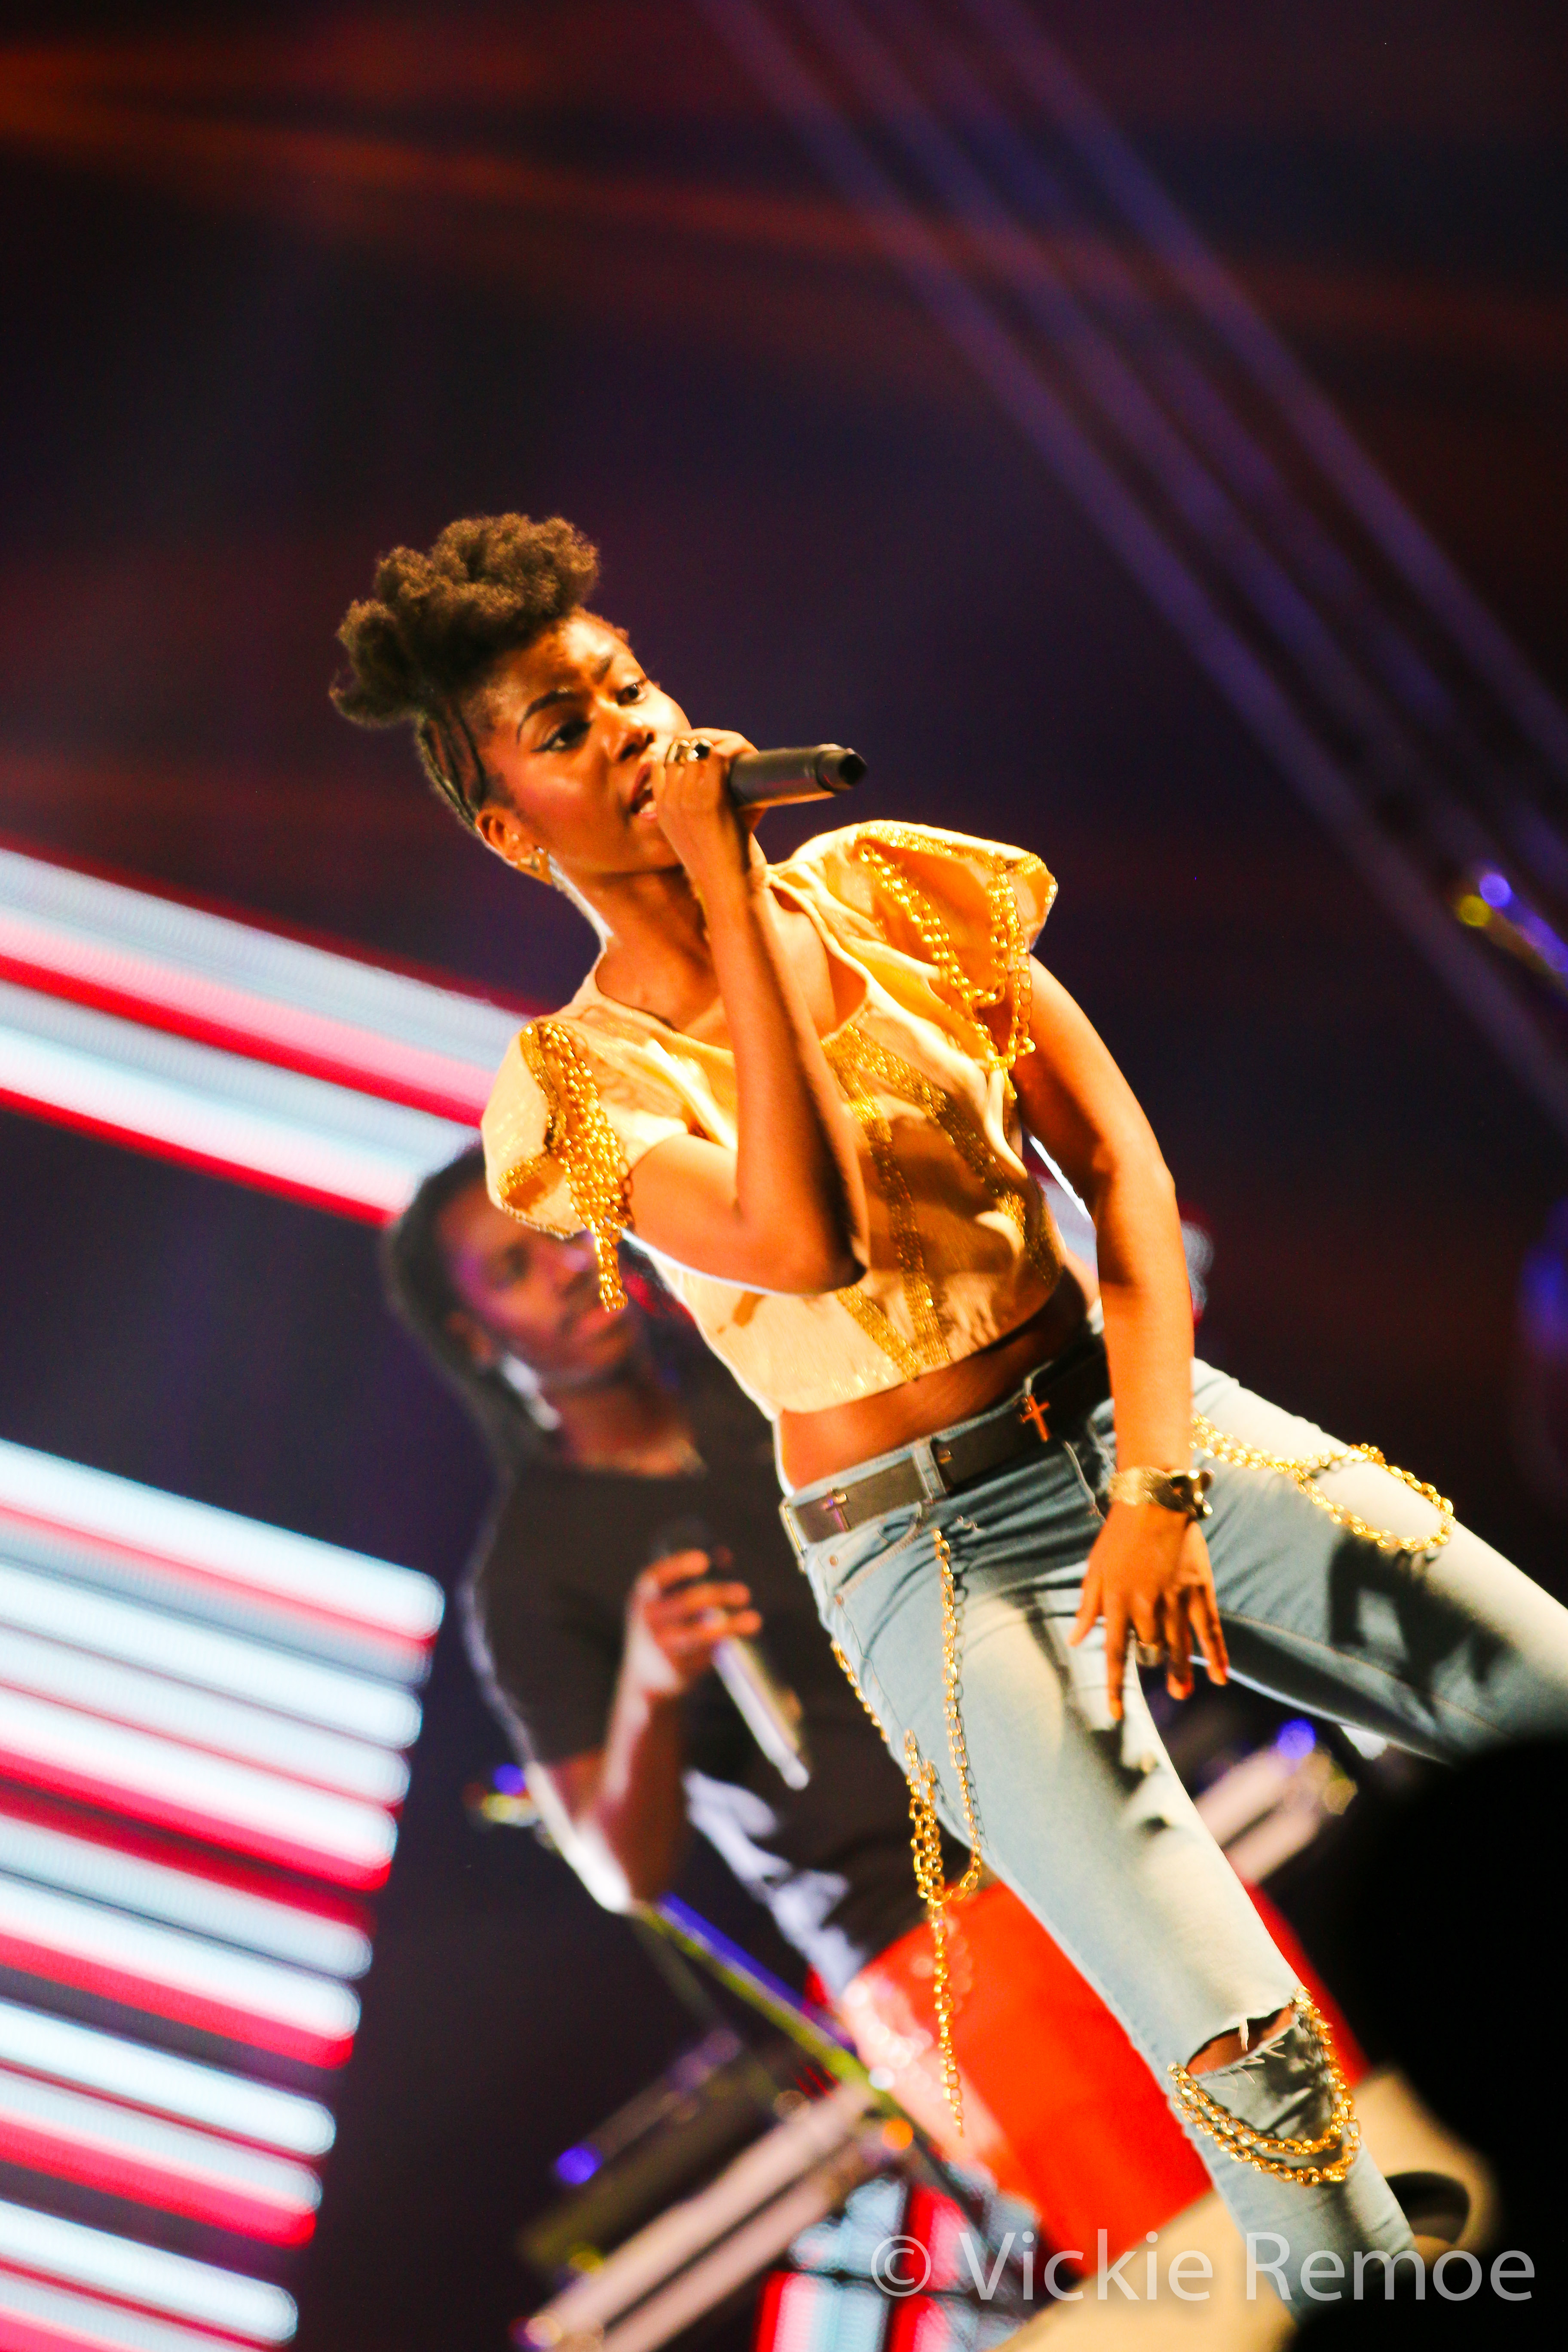 LaurynHillinGhana_Wanlov_BBNZ-Concert_StoneBoy-MissV-2014-6